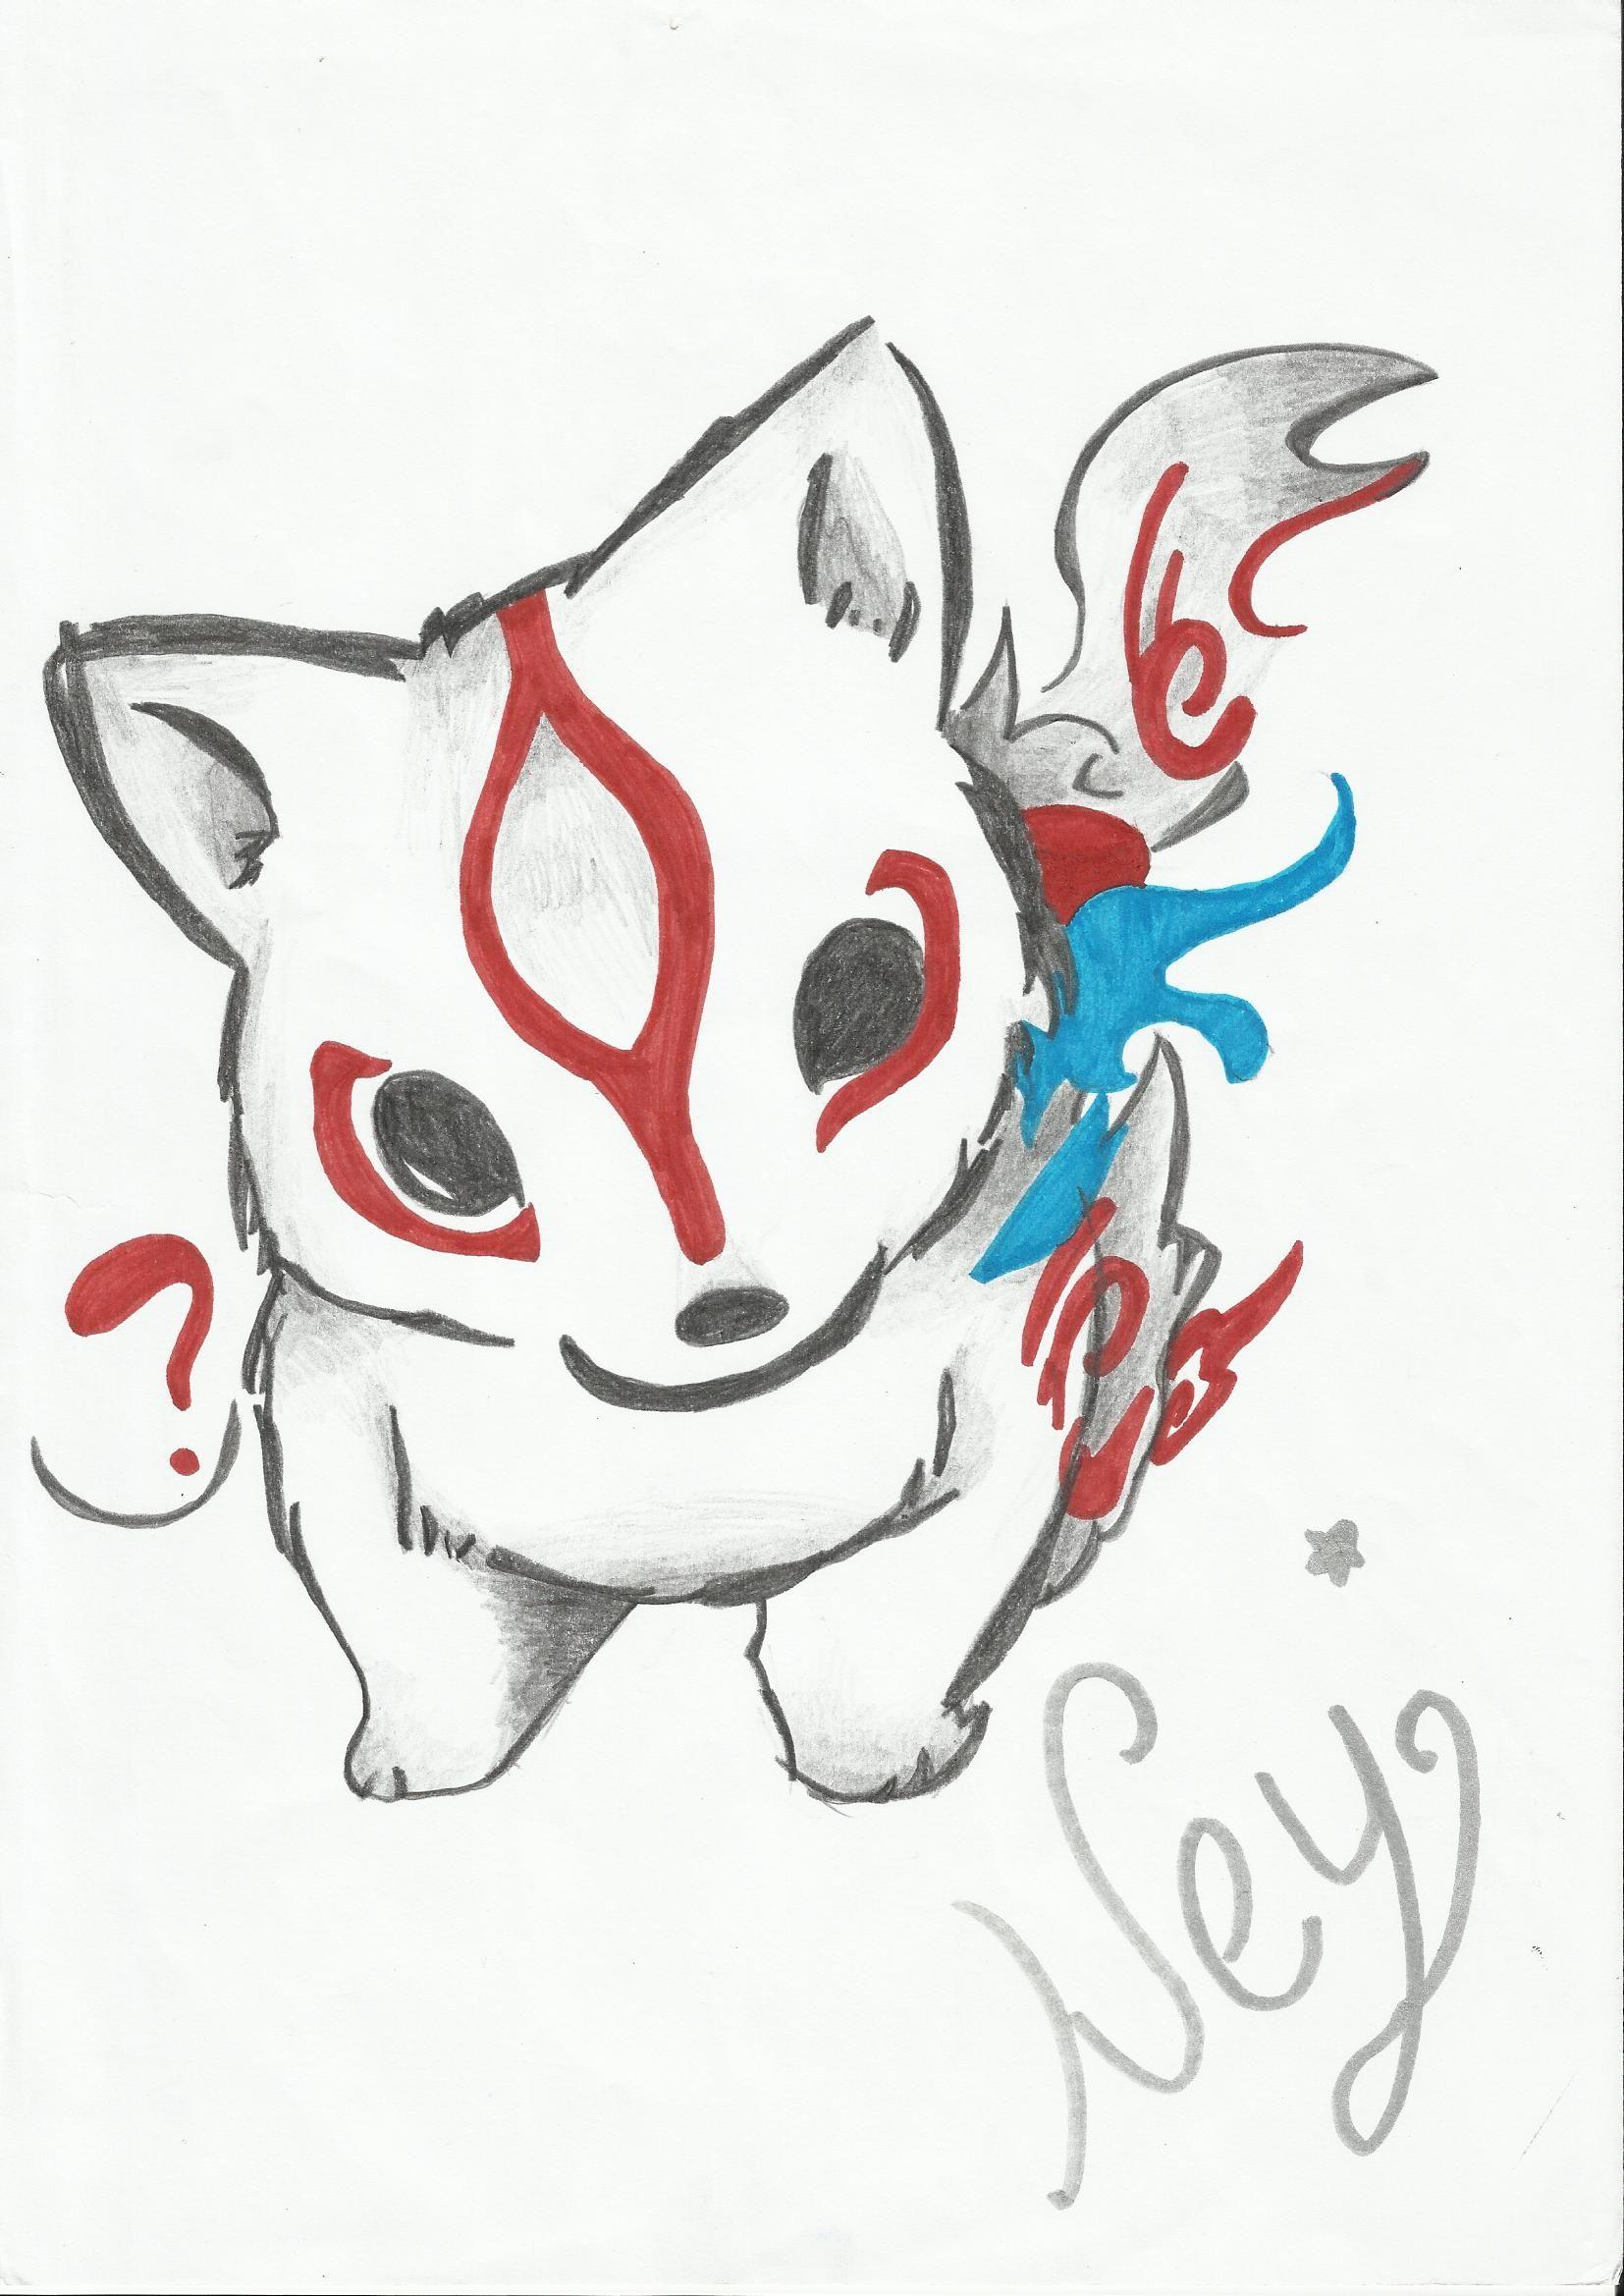 Worksheet. dibujosanime322jpg 16542338  De todo un poco  Pinterest